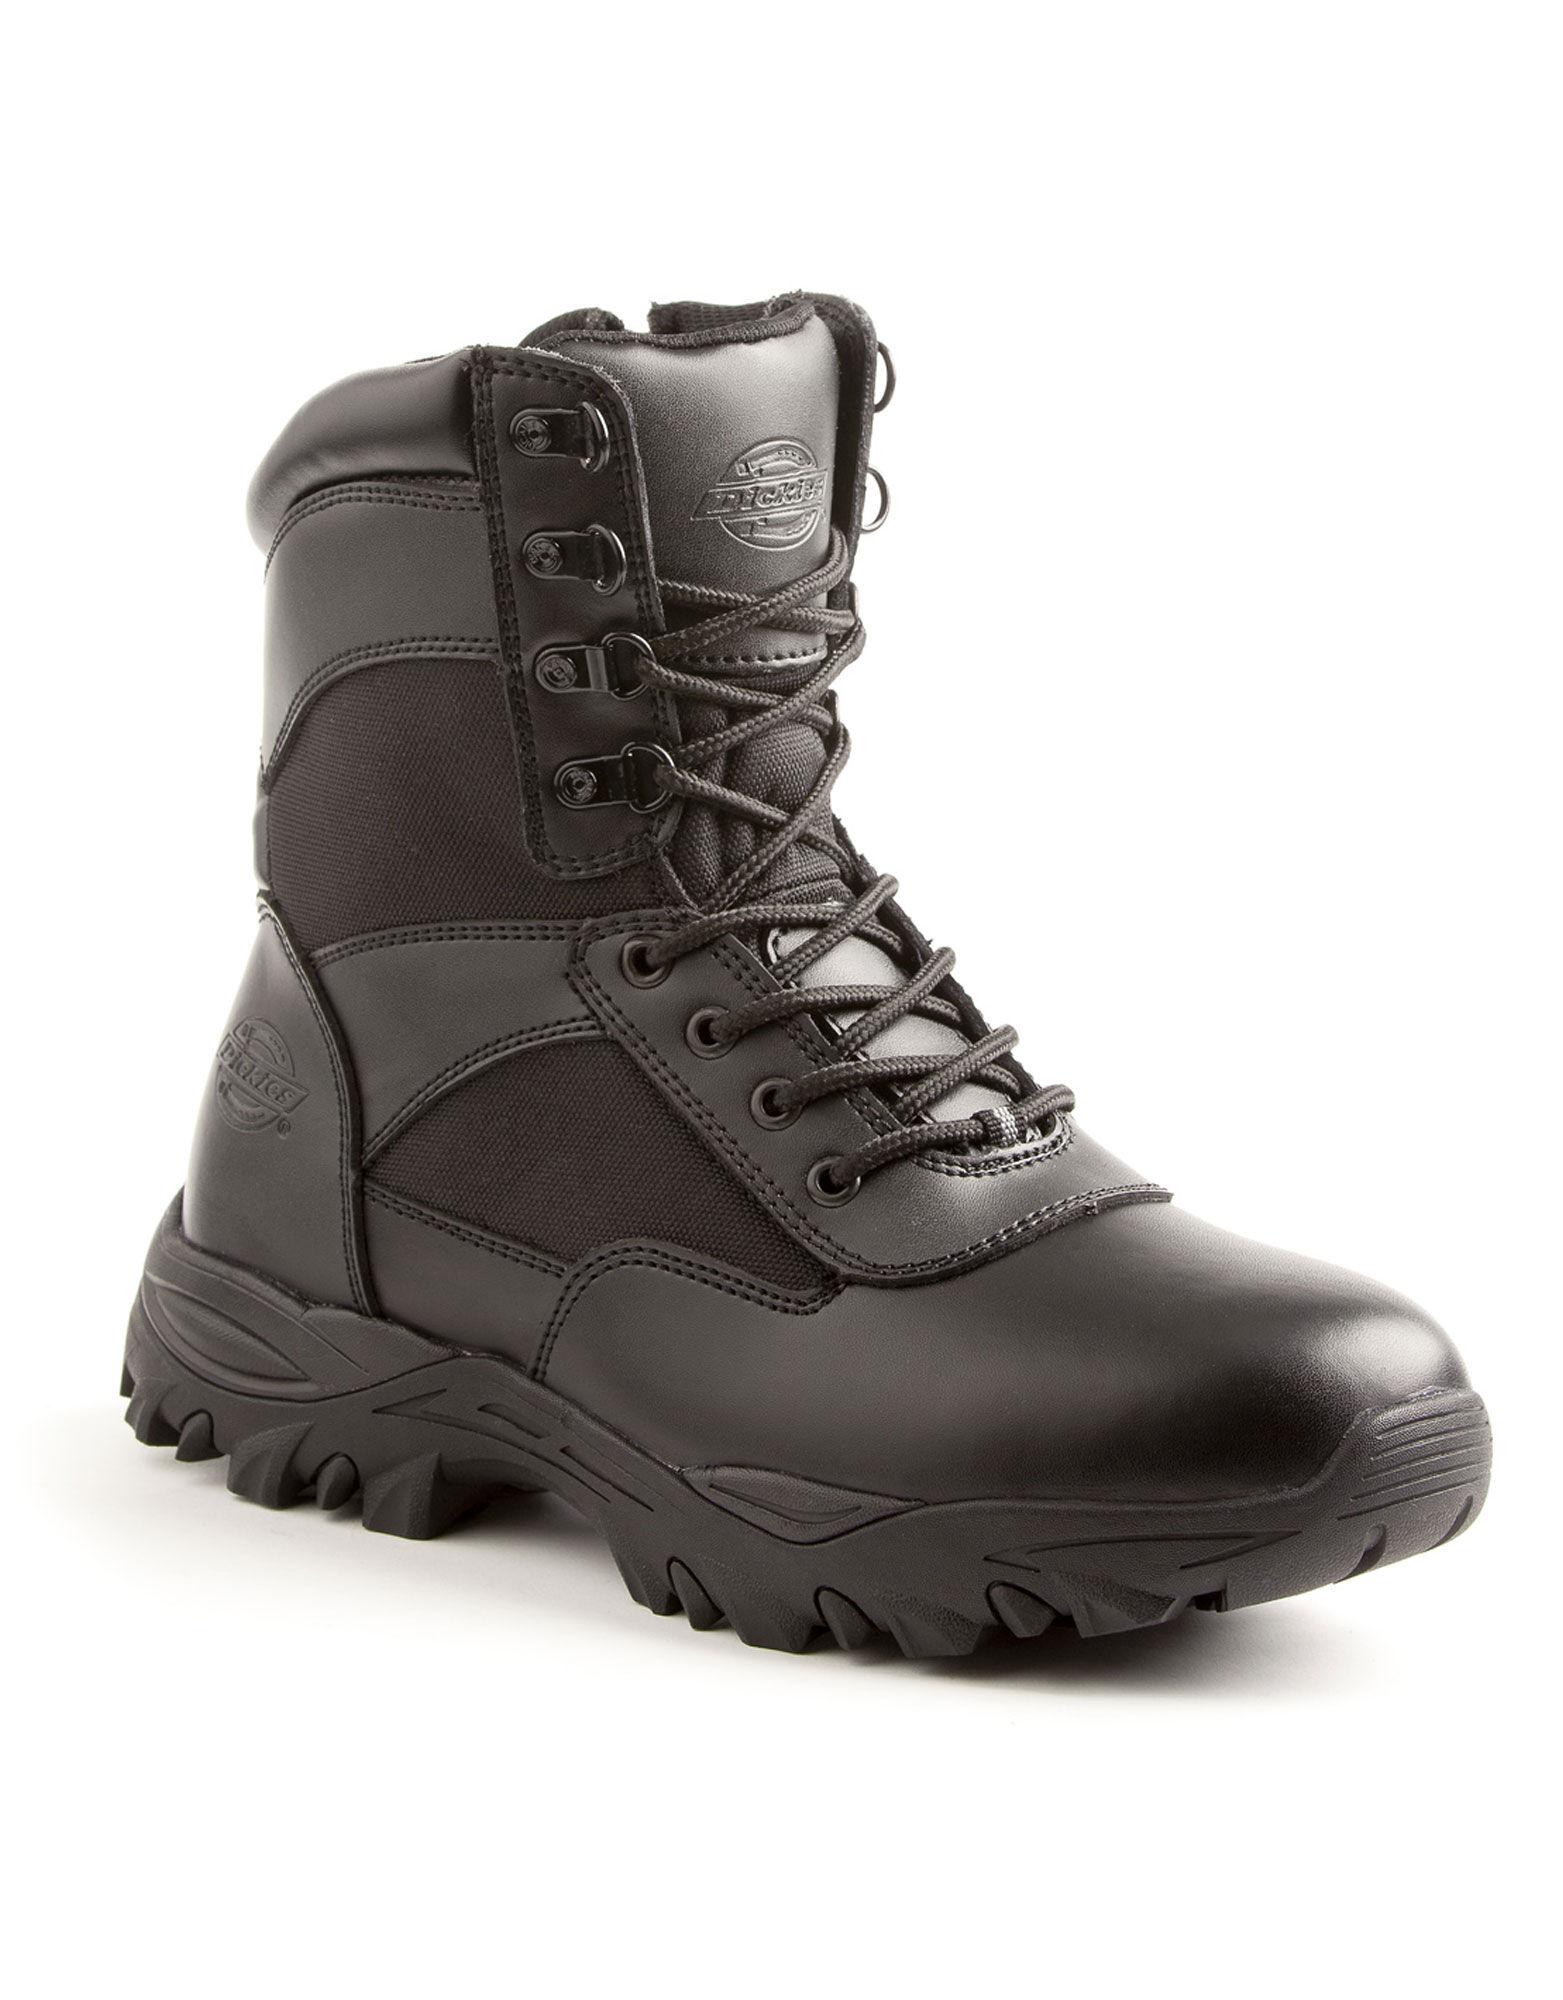 Black Work Boots For Men Galleryhipcom The Hippest